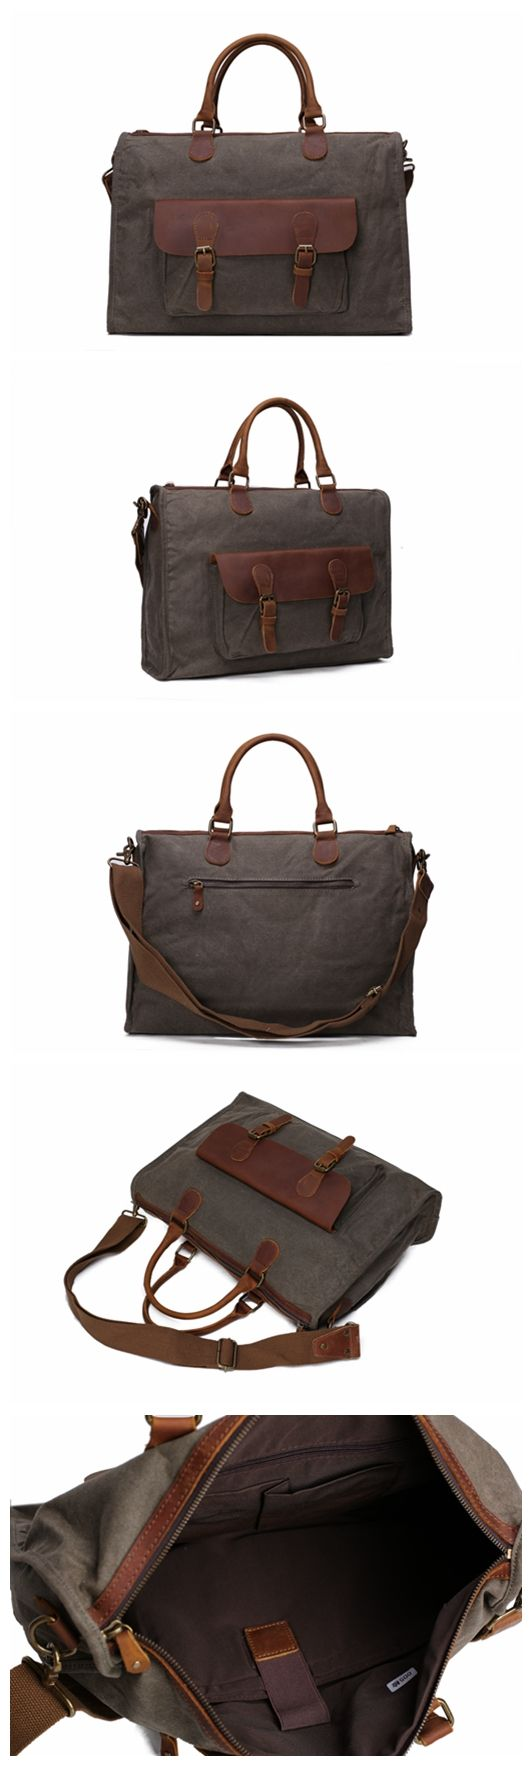 Vintage Canvas Leather Messenger Bag Canvas Leather Satchel Canvas 15 Inch Laptop Bag Crossbody Shoulder Bag Canvas Leather Handbag Men's Briefcase